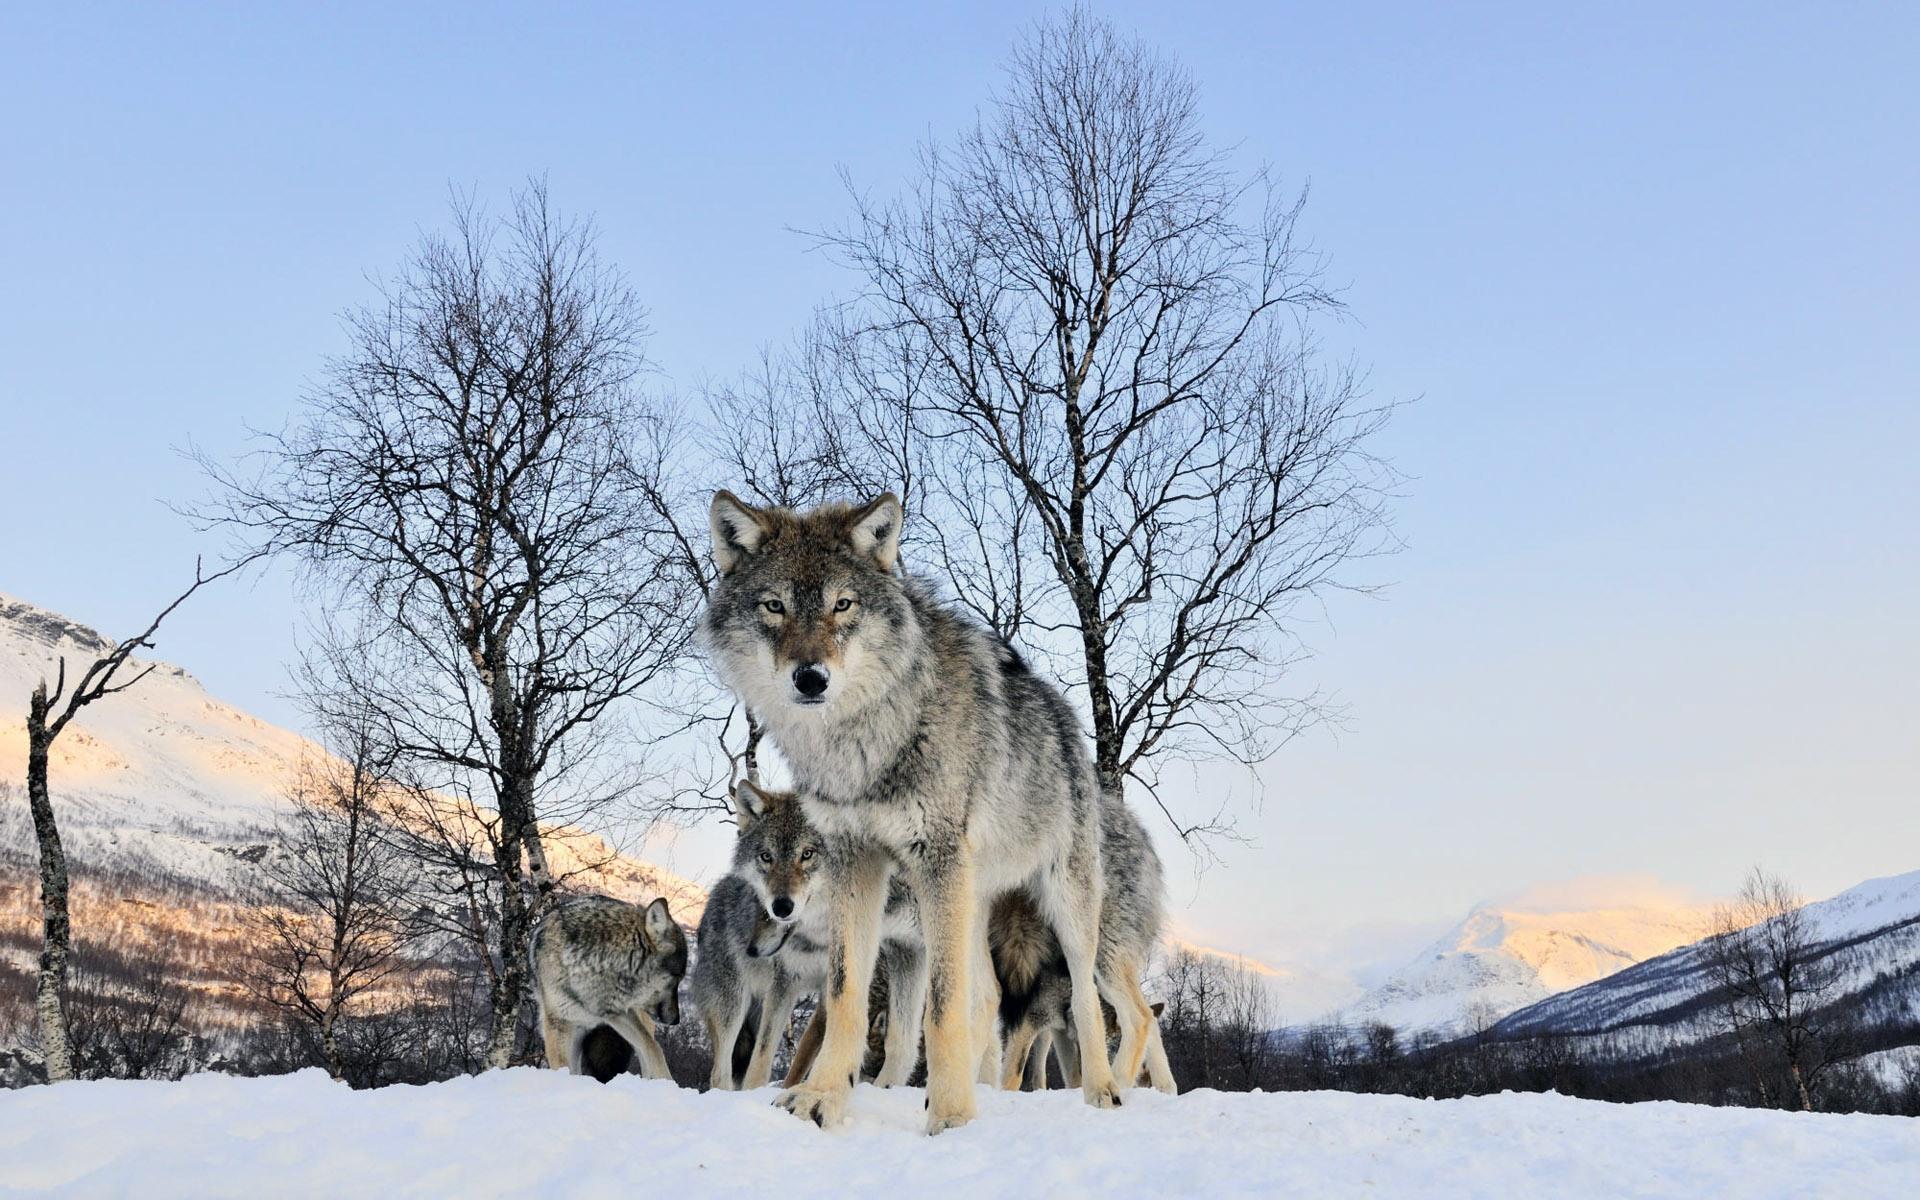 [45+] Pack of Wolves Wallpaper on WallpaperSafari - photo#23